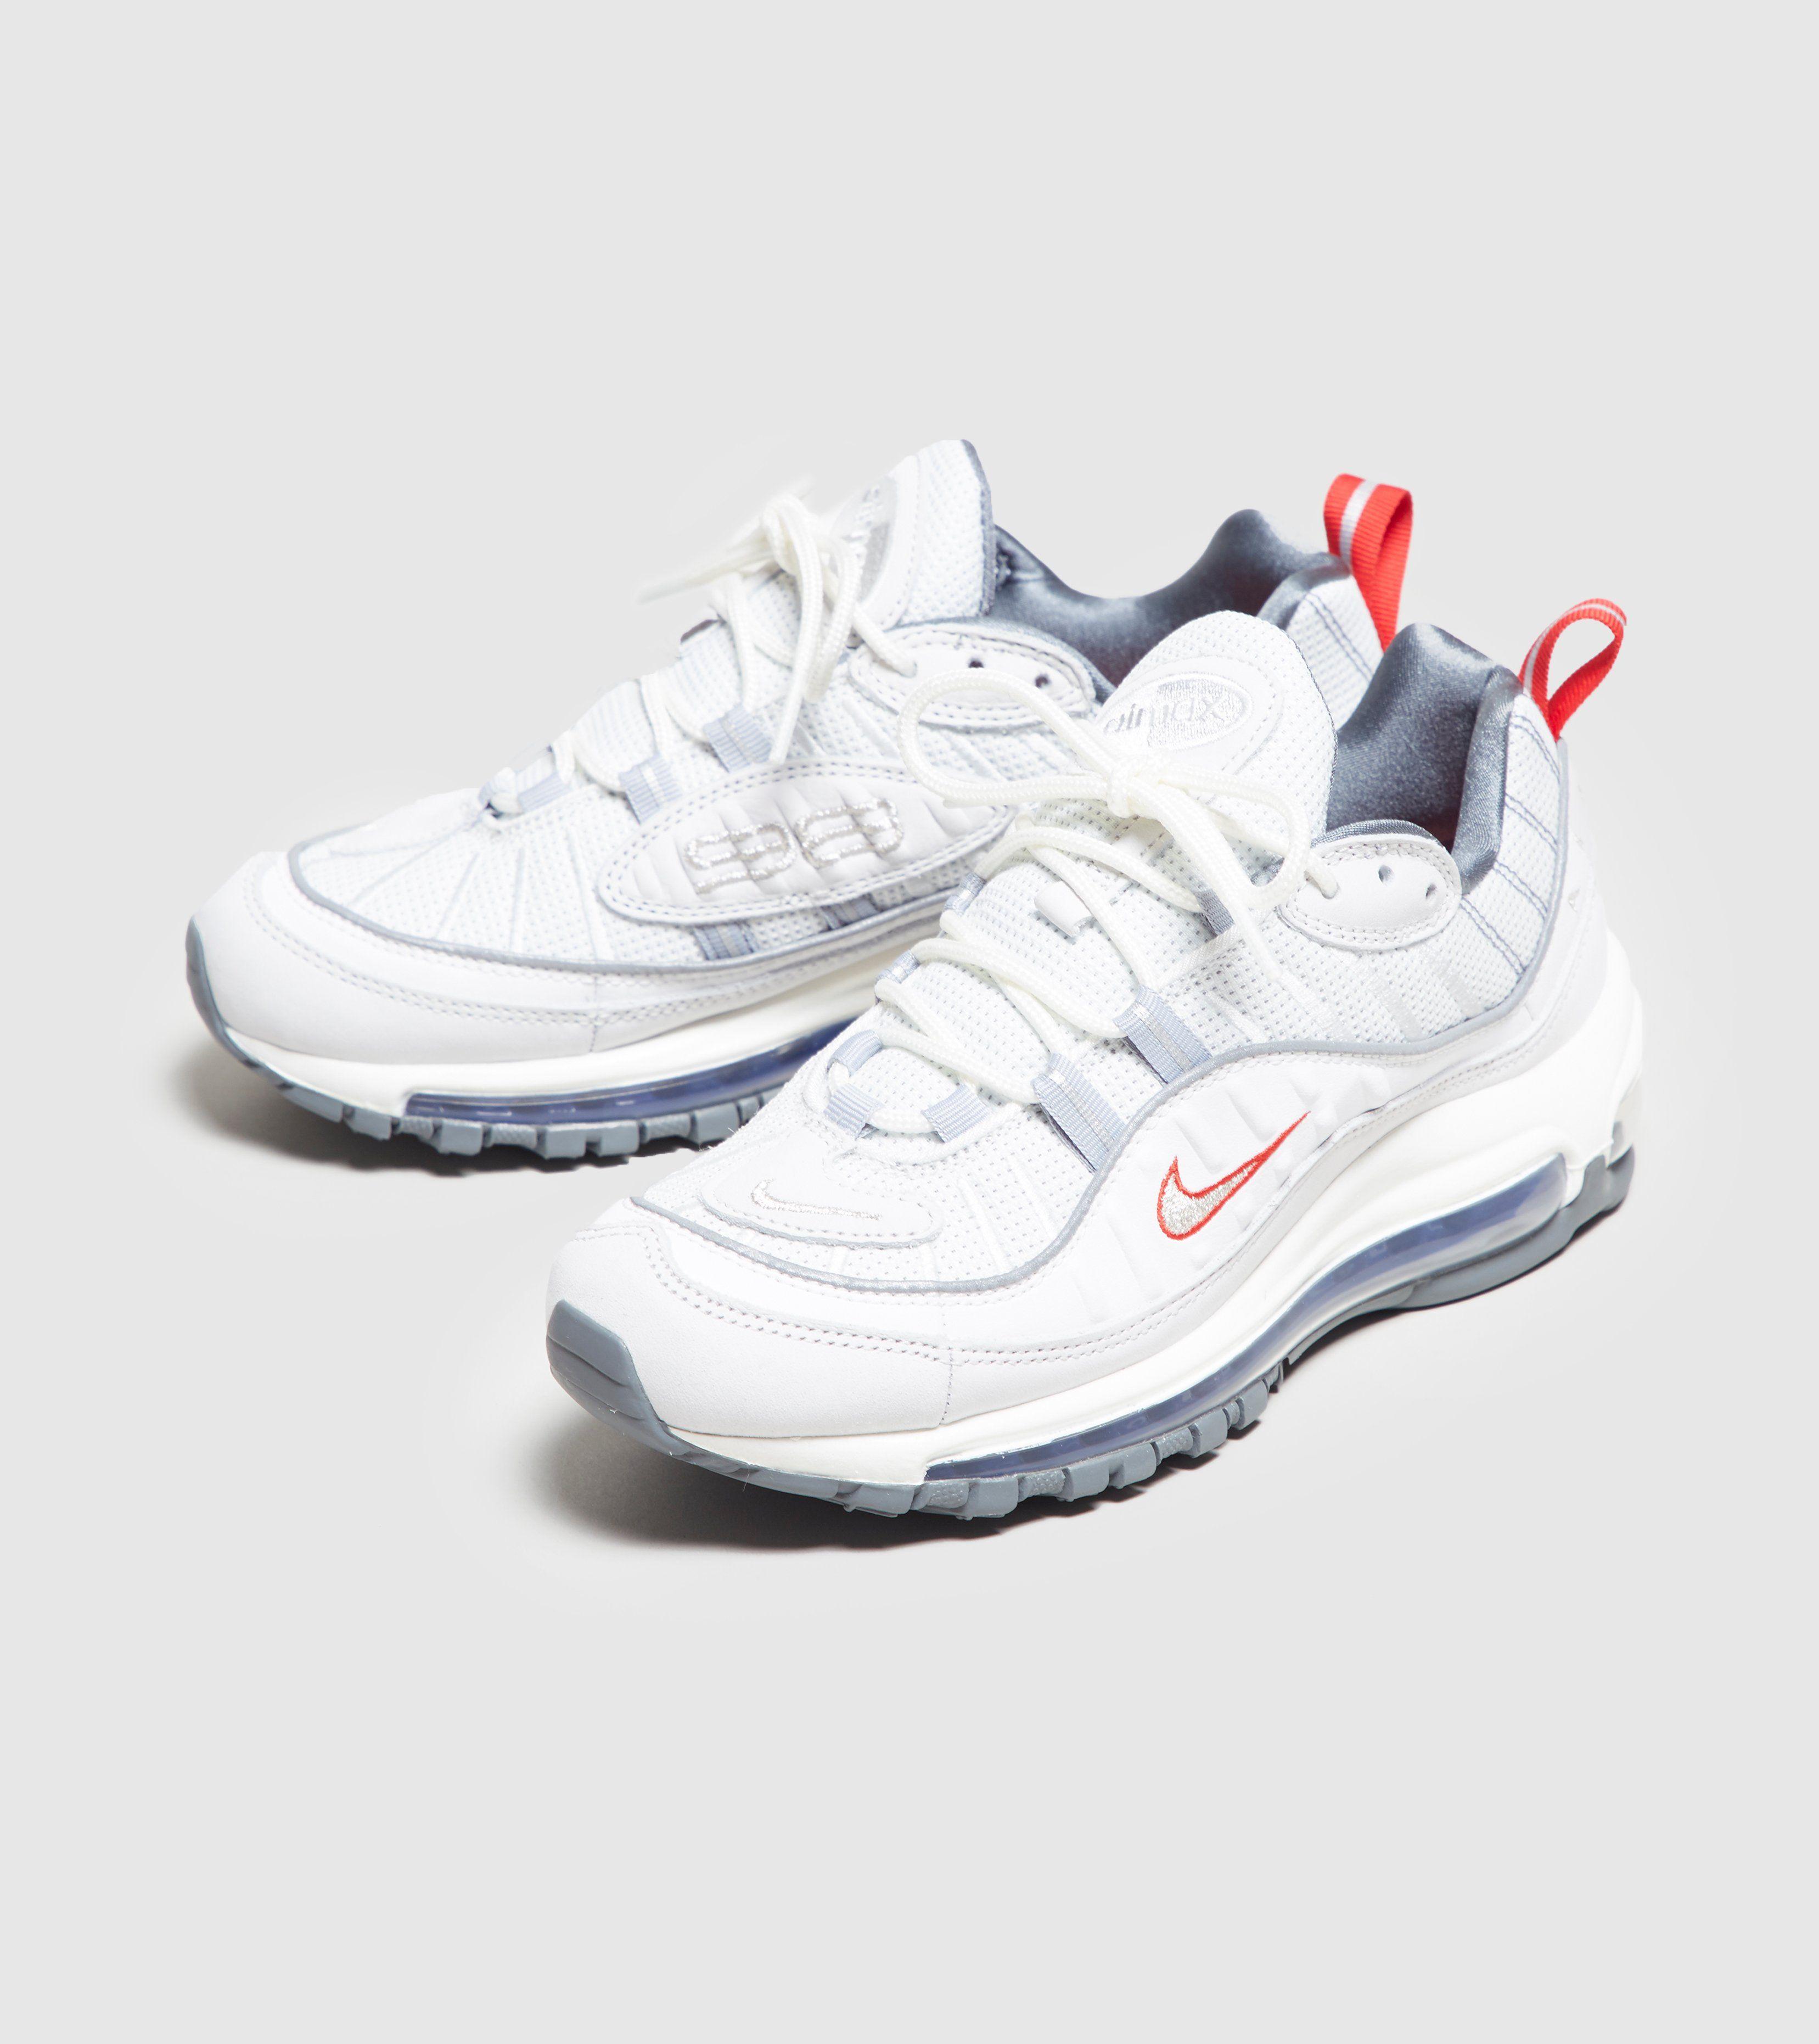 Nike Air Max 98 Women's